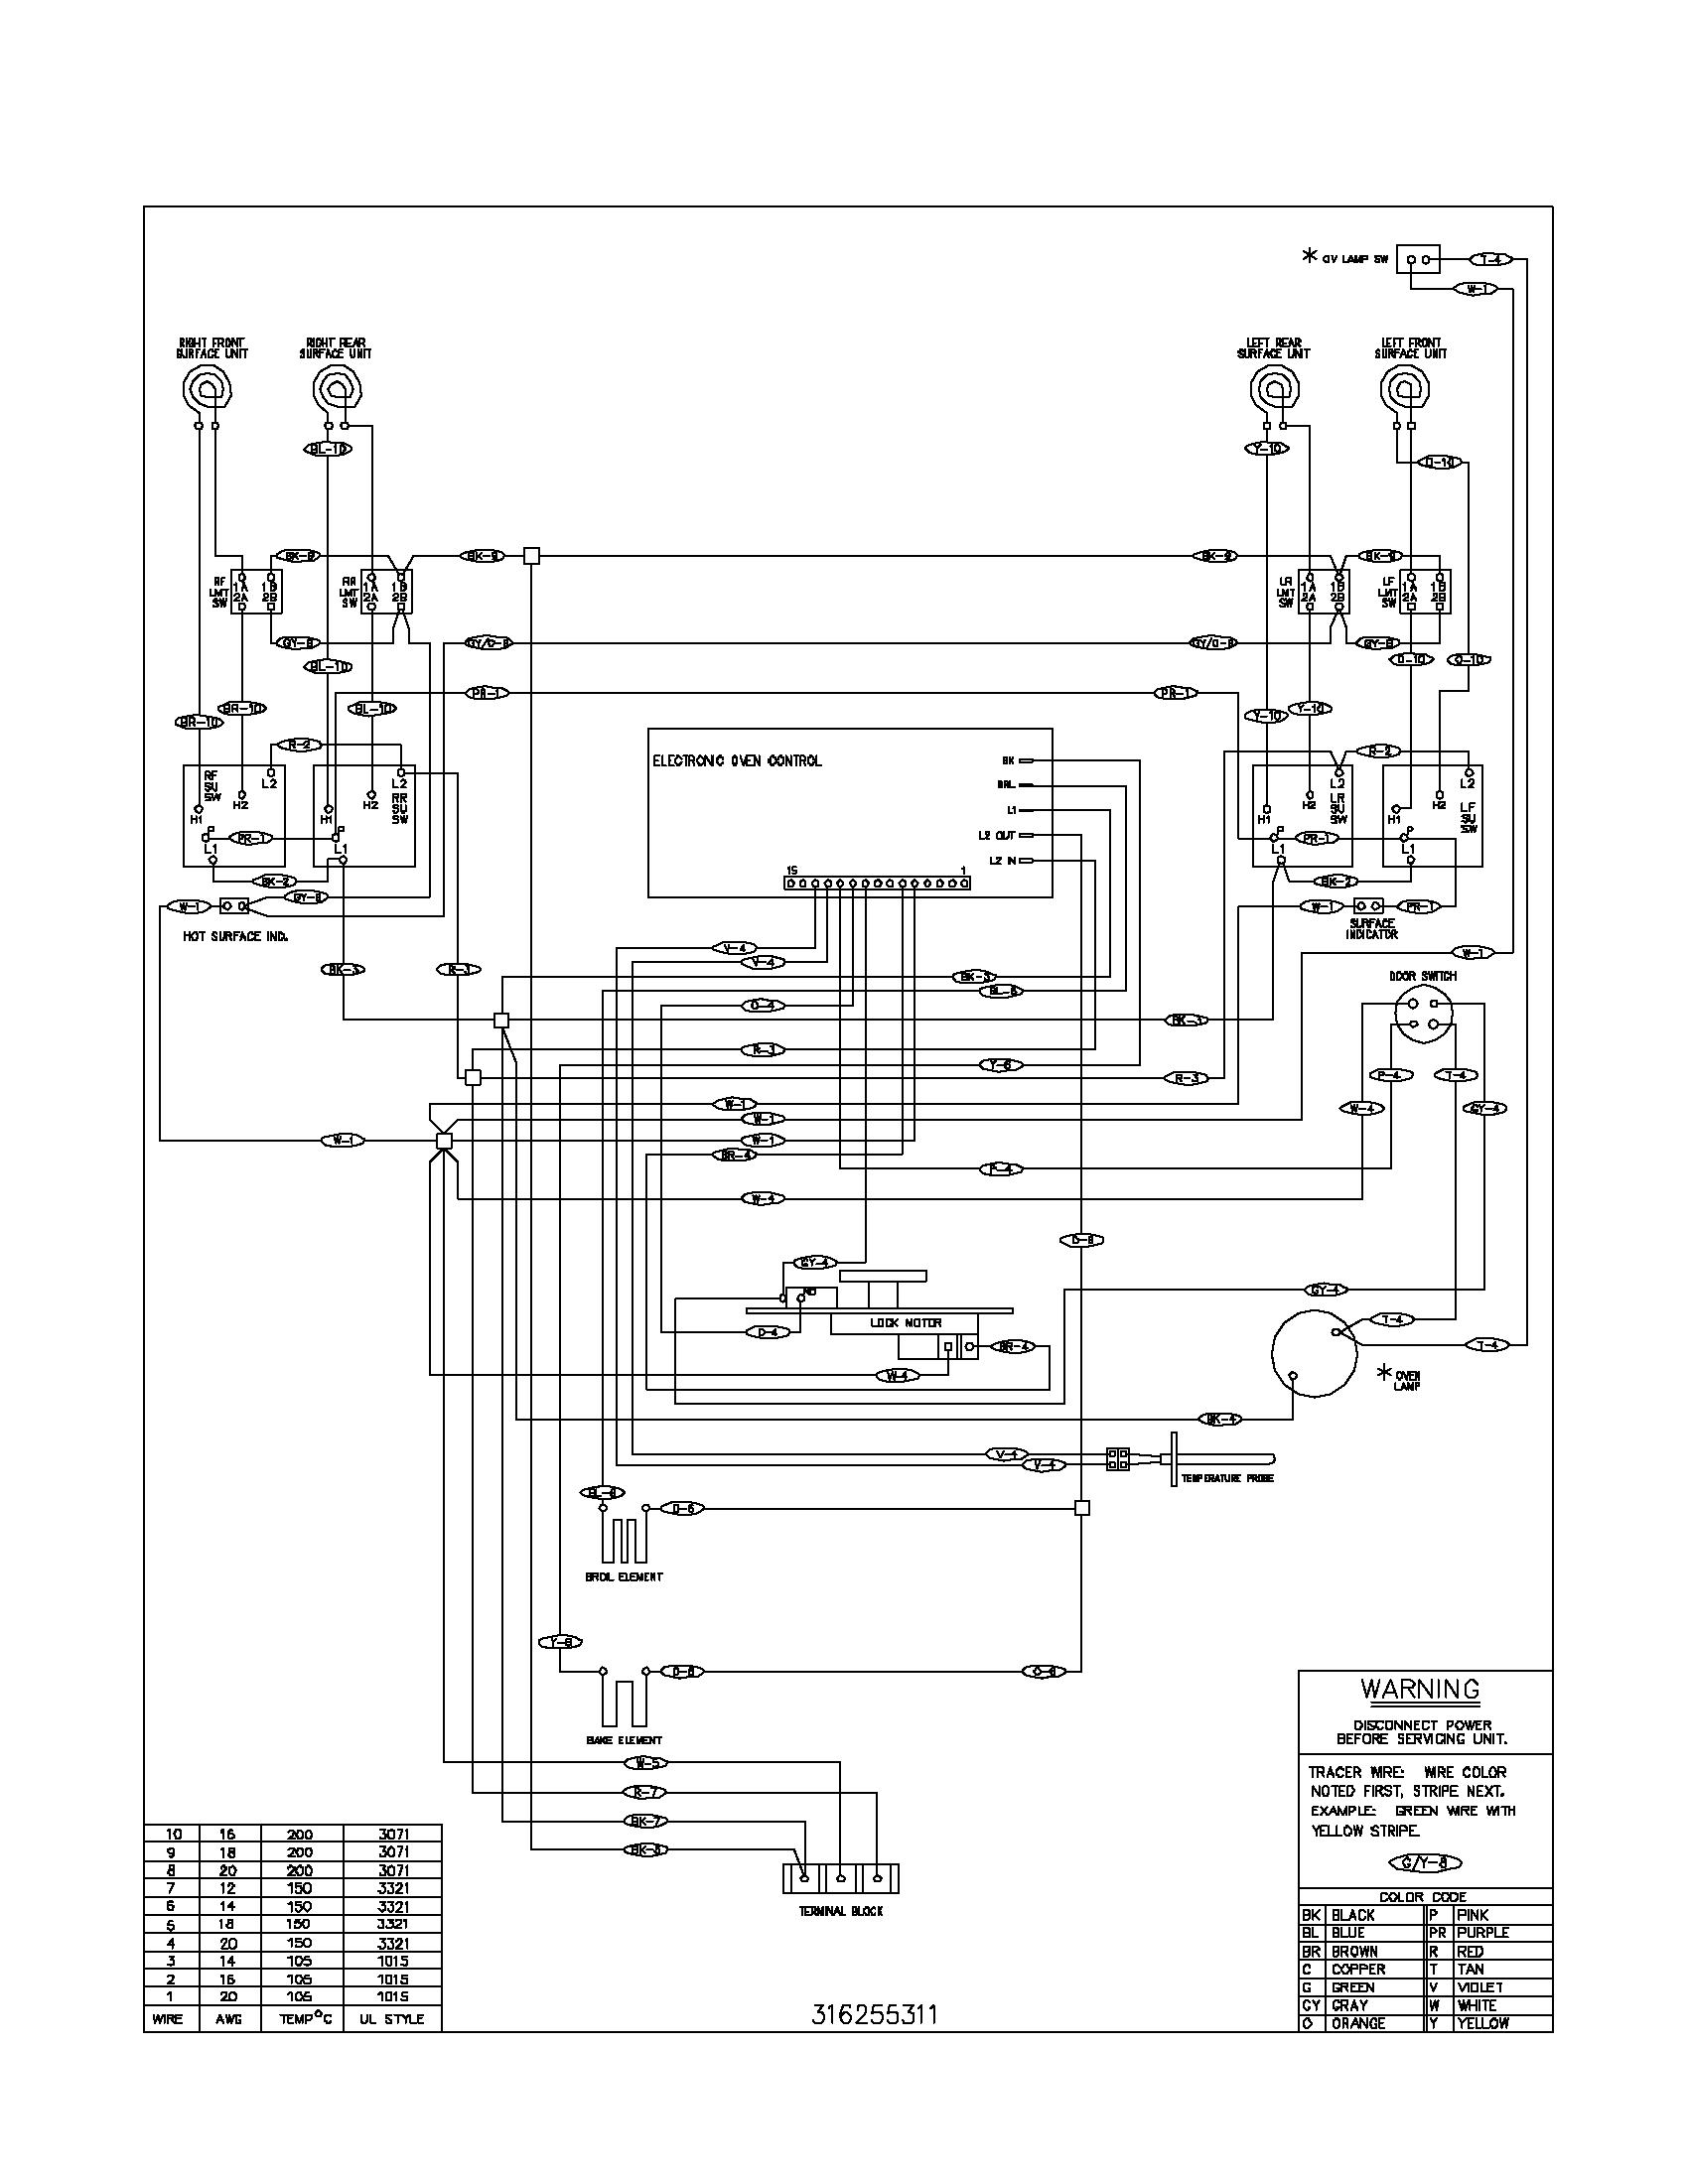 frigidaire oven wiring diagram wiring diagram val wiring diagram for a frigidaire oven wiring diagram for frigidaire oven [ 1700 x 2200 Pixel ]